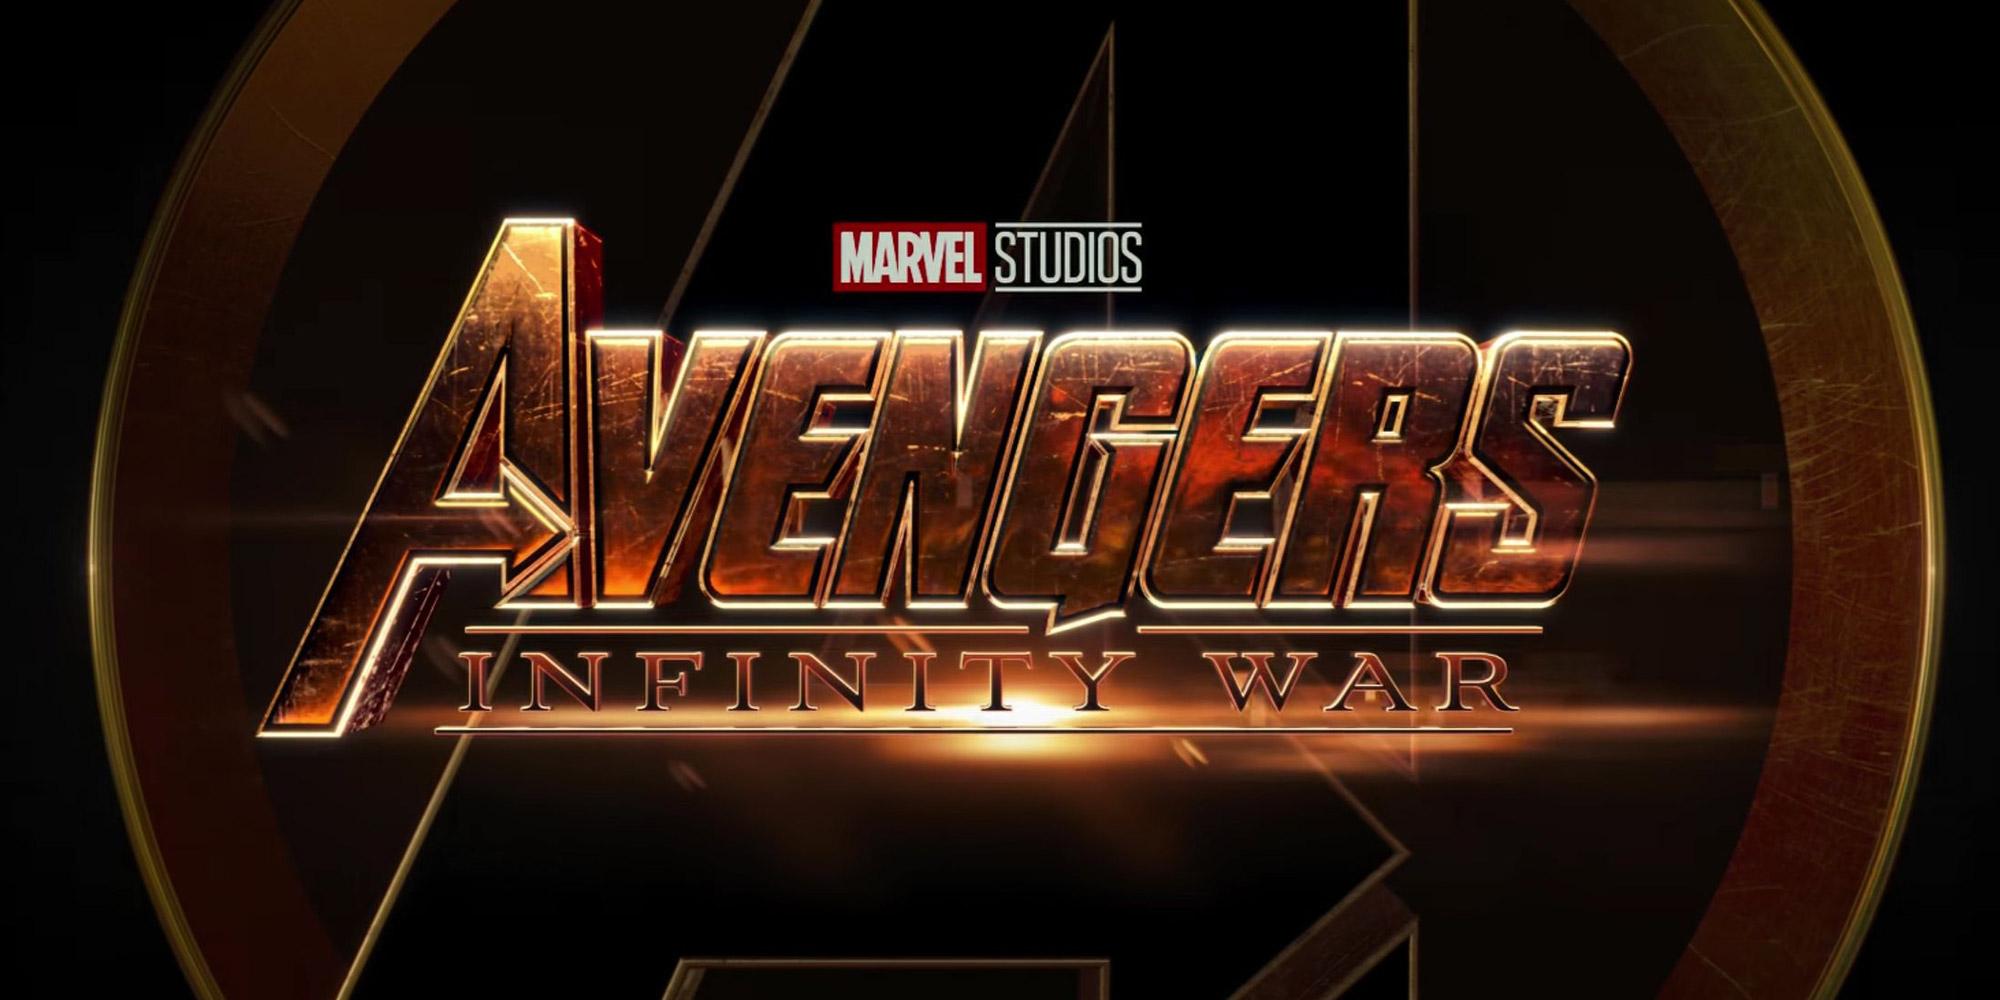 Spectaculaire nouvelle bande-annonce pour Avengers: Infinity Wars